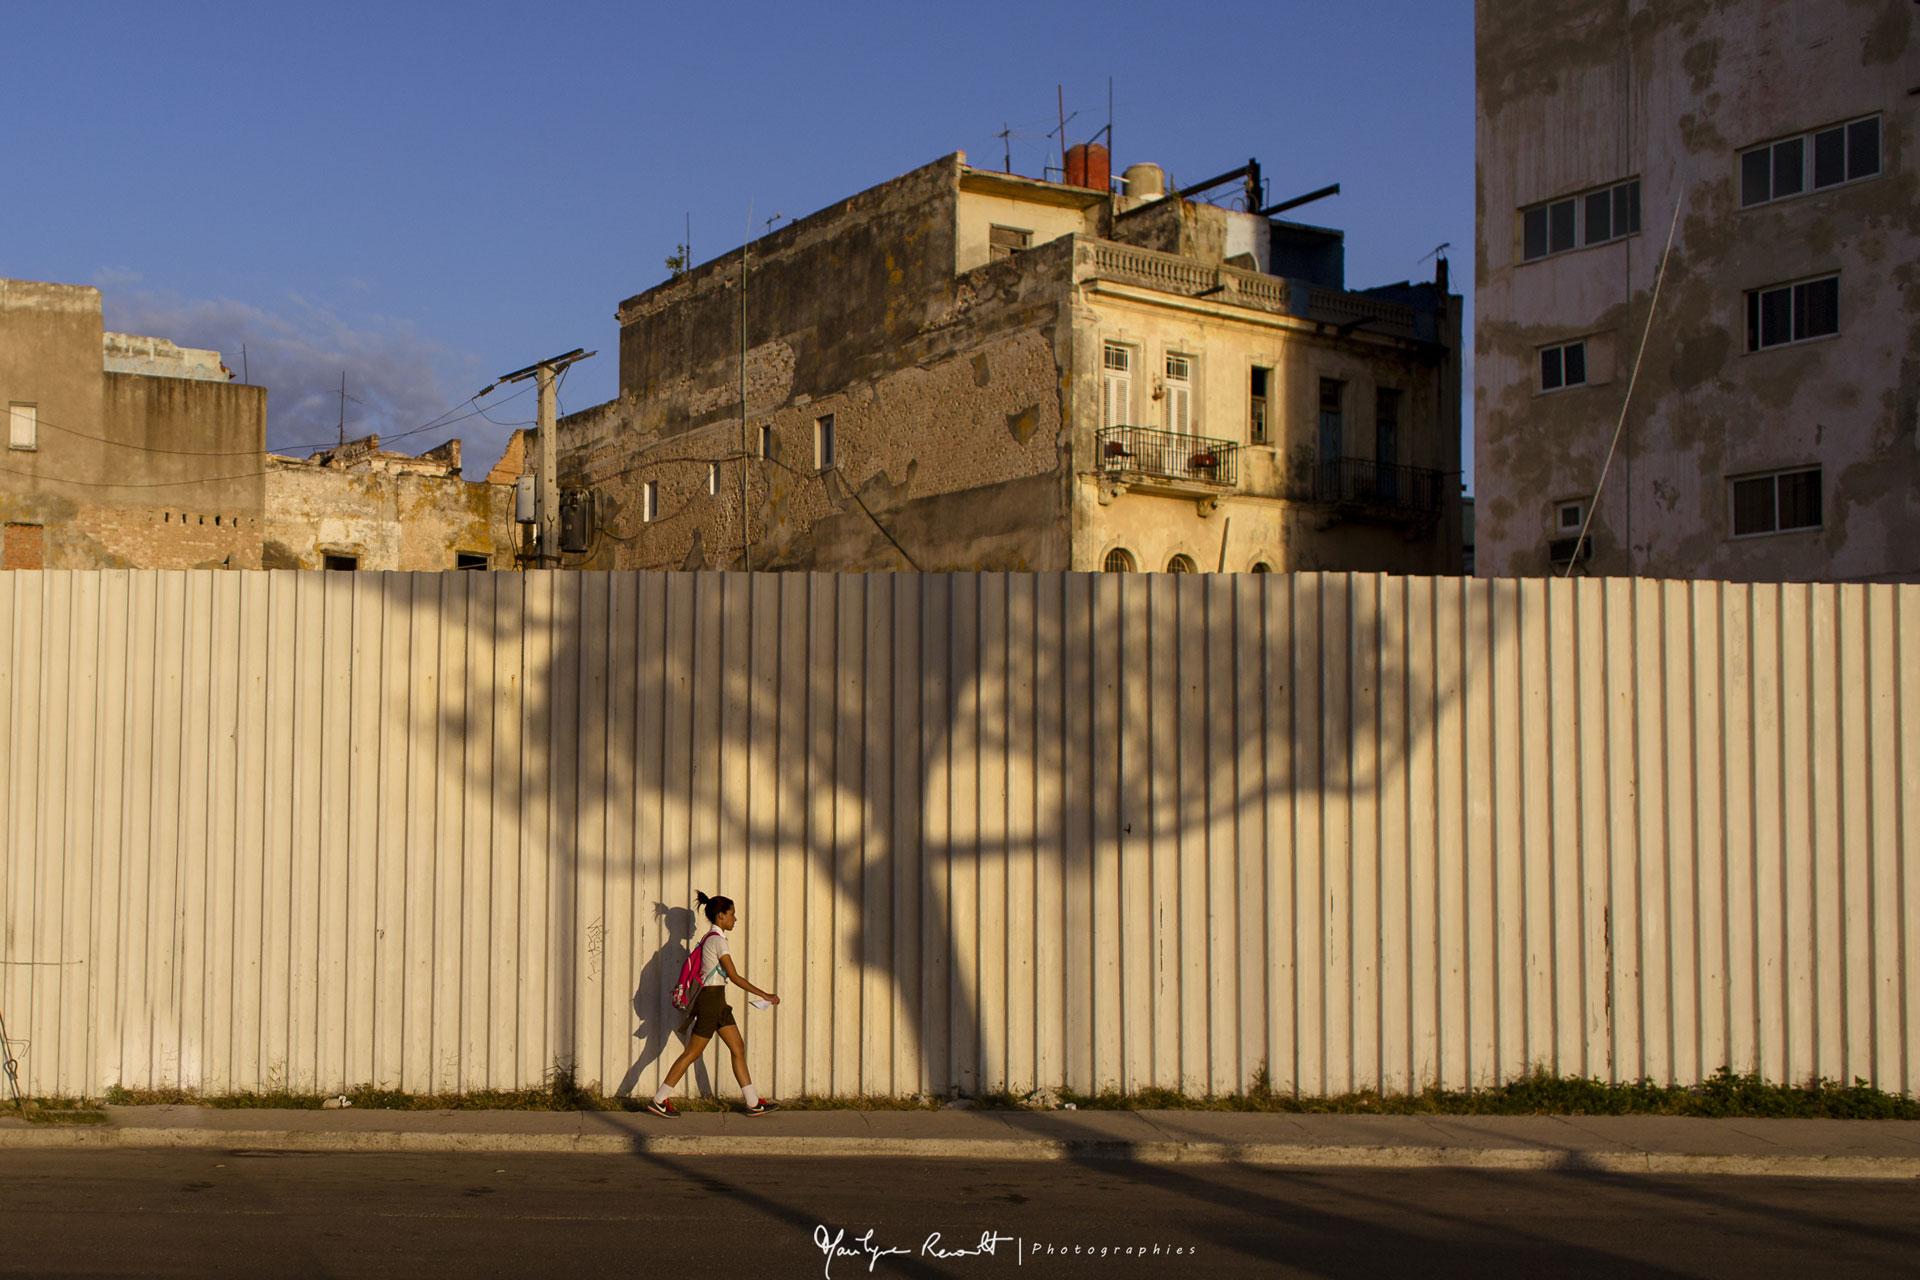 15-Cuba-marilyne renoult